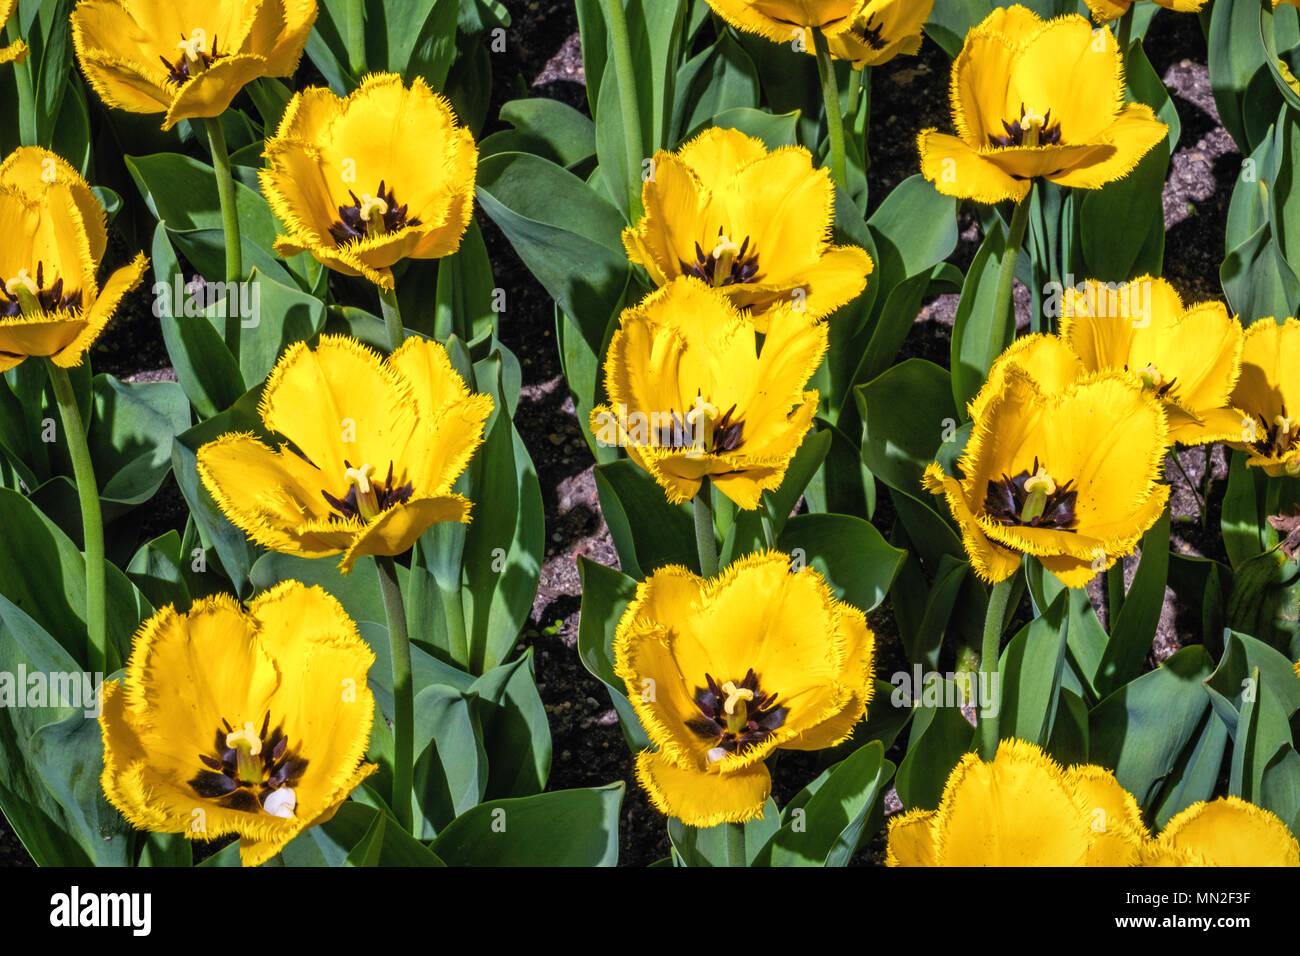 Britzer garten neuklln berlin germany 2018 garden with spring britzer garten neuklln berlin germany 2018 garden with spring flowering bulbs yellow tulips with frilly petals black centre mightylinksfo